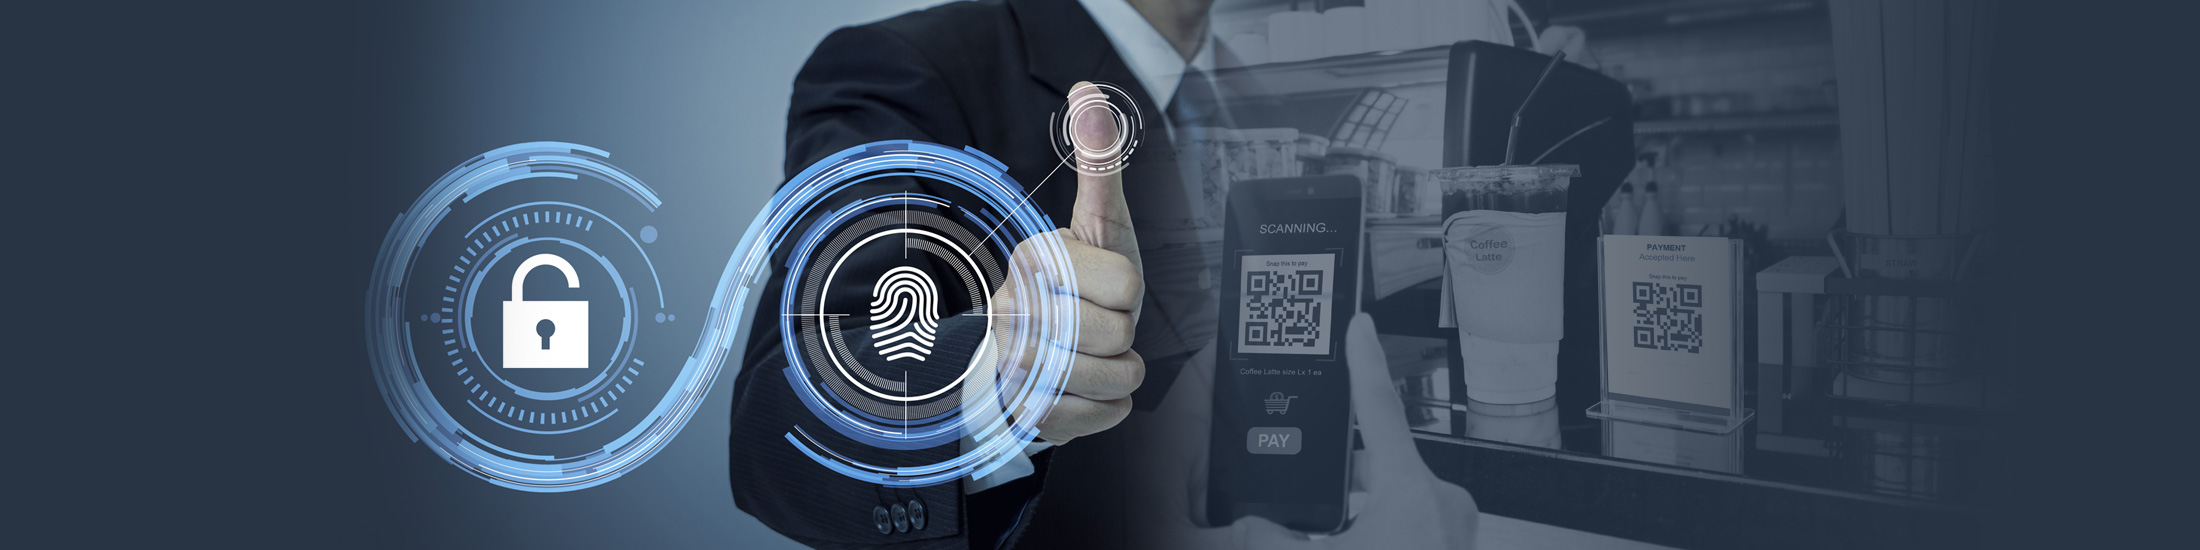 Report: Consumers More Confident in Biometrics, QR Code Payments